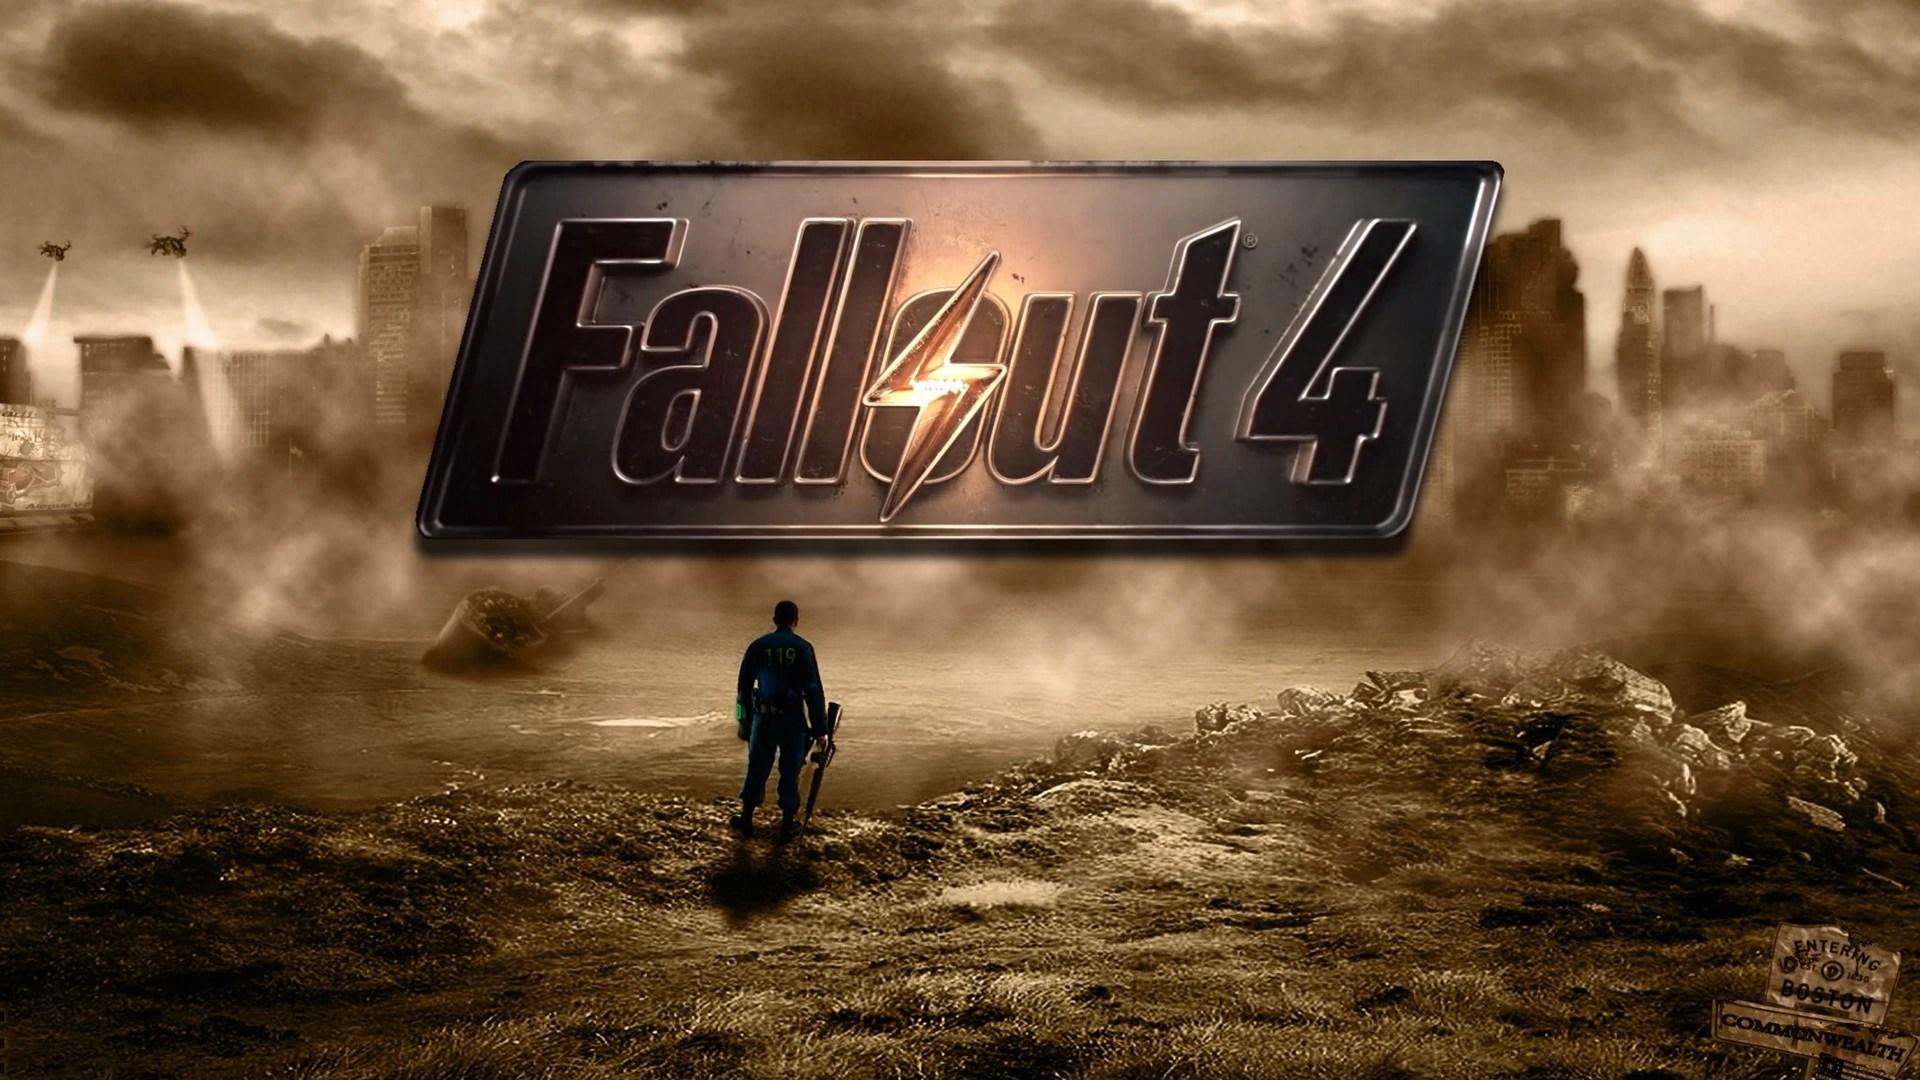 Fall Wallpaper 1440p Image Fallout 4 Wallpaper Hd Resolution B7vb5 Jpg